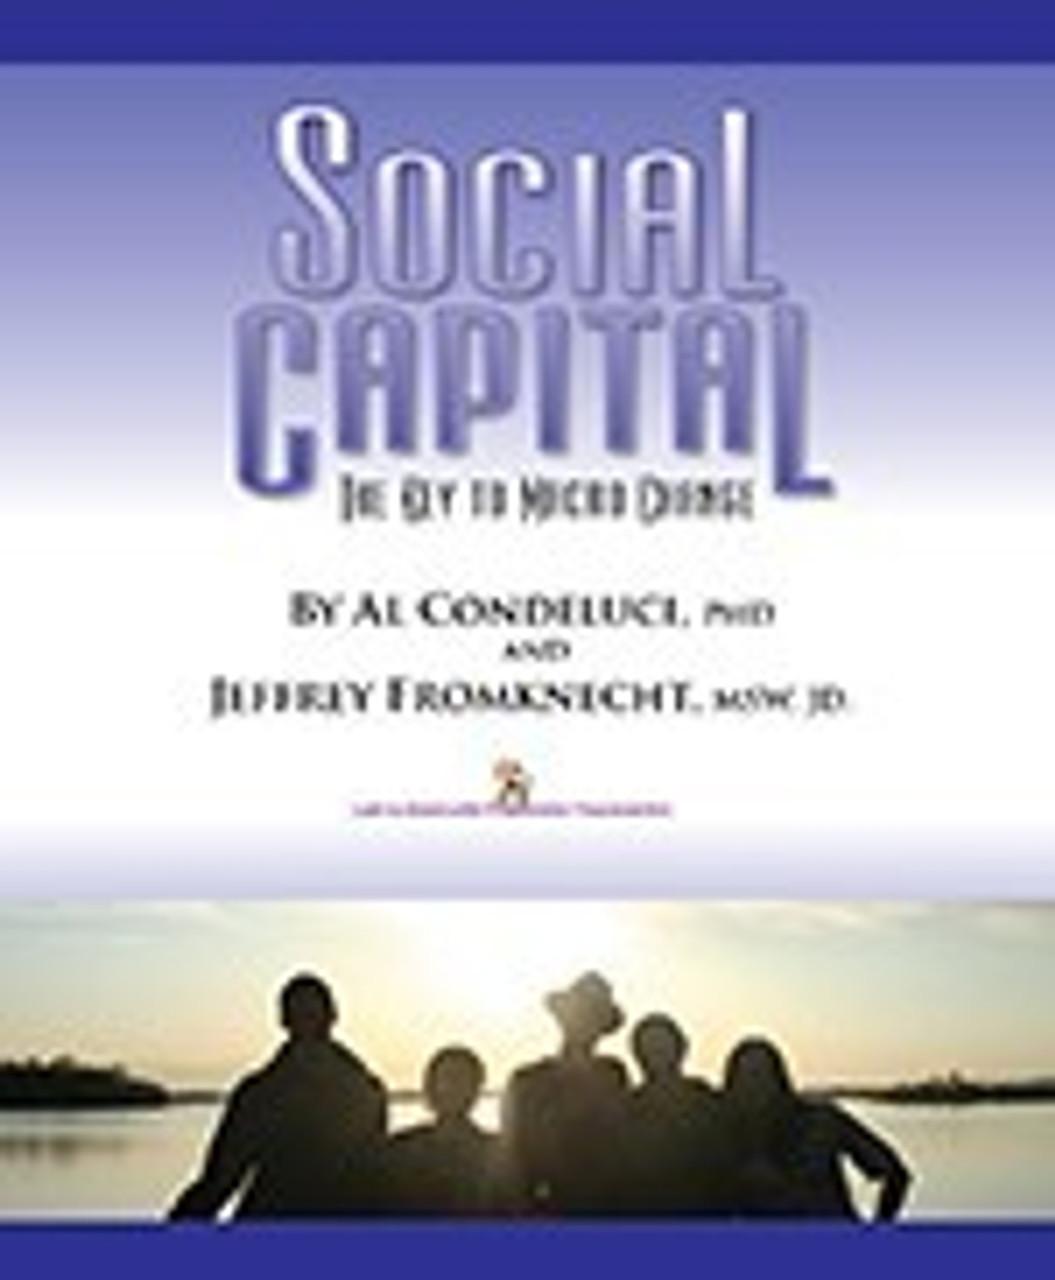 Social Capital: The Key to Macro Change - eBook